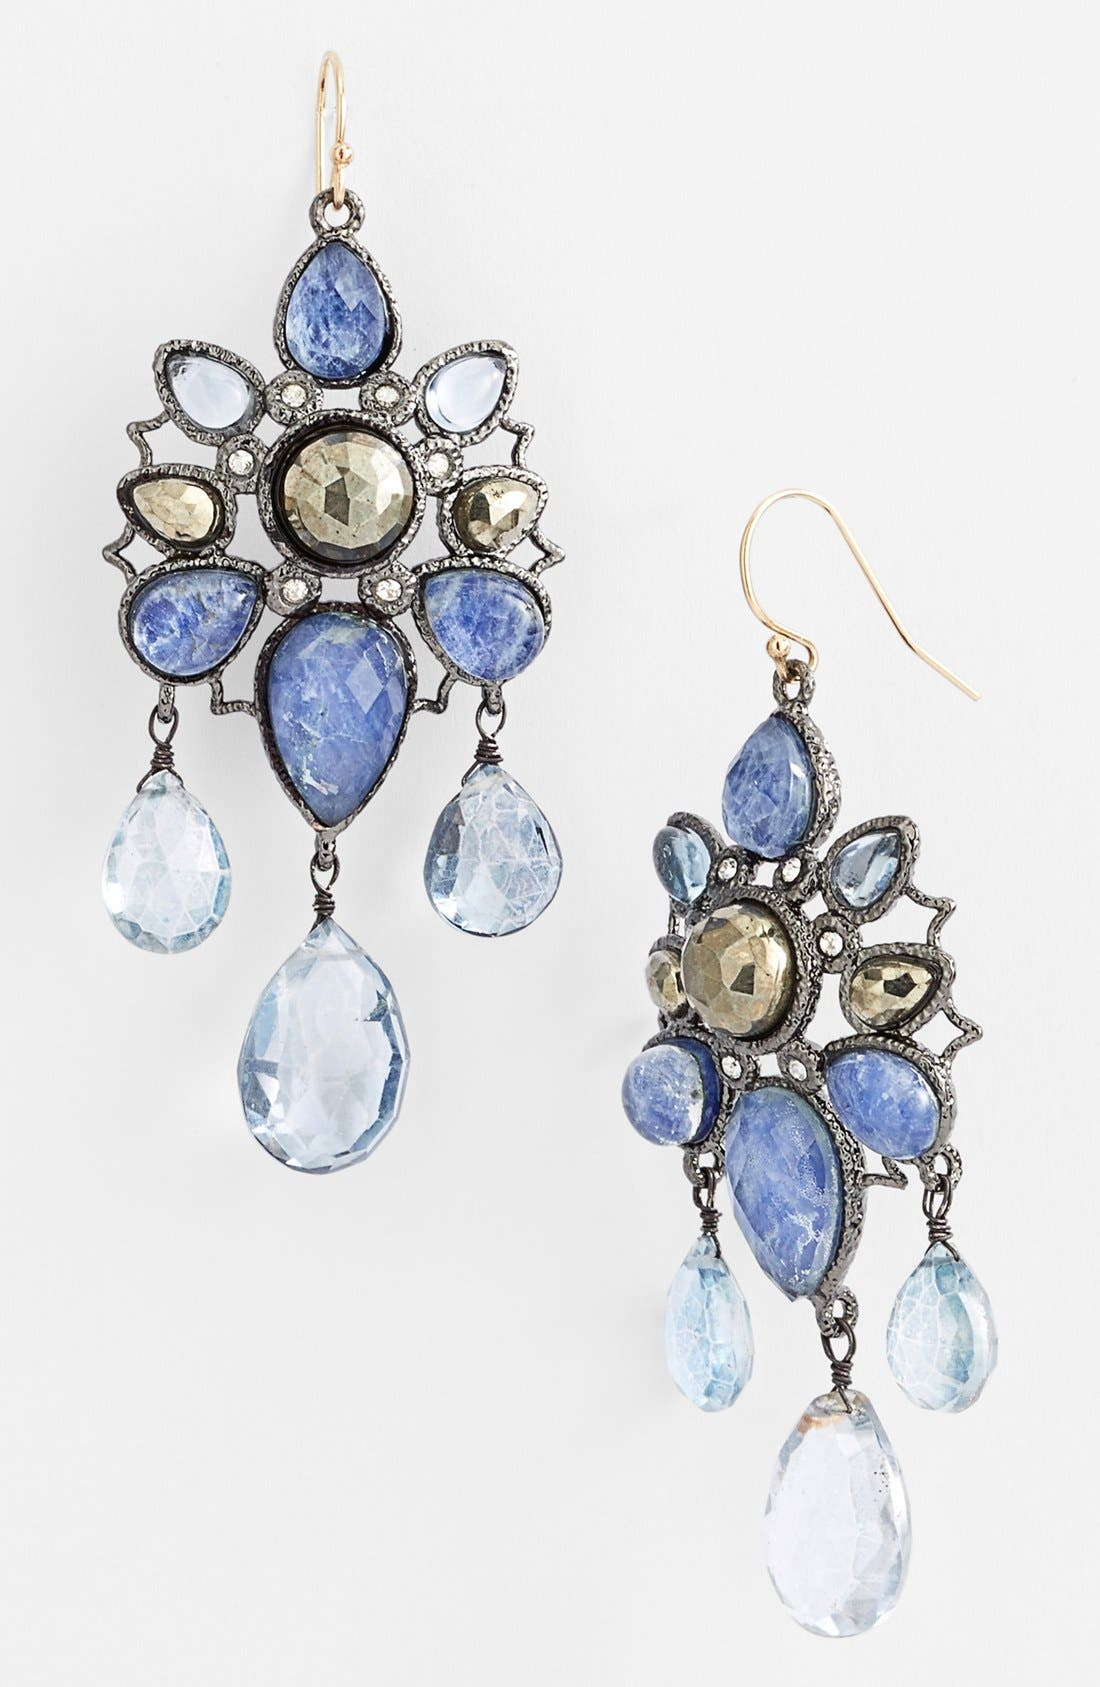 Main Image - Alexis Bittar 'Elements - Jardin de Papillon' Statement Earrings